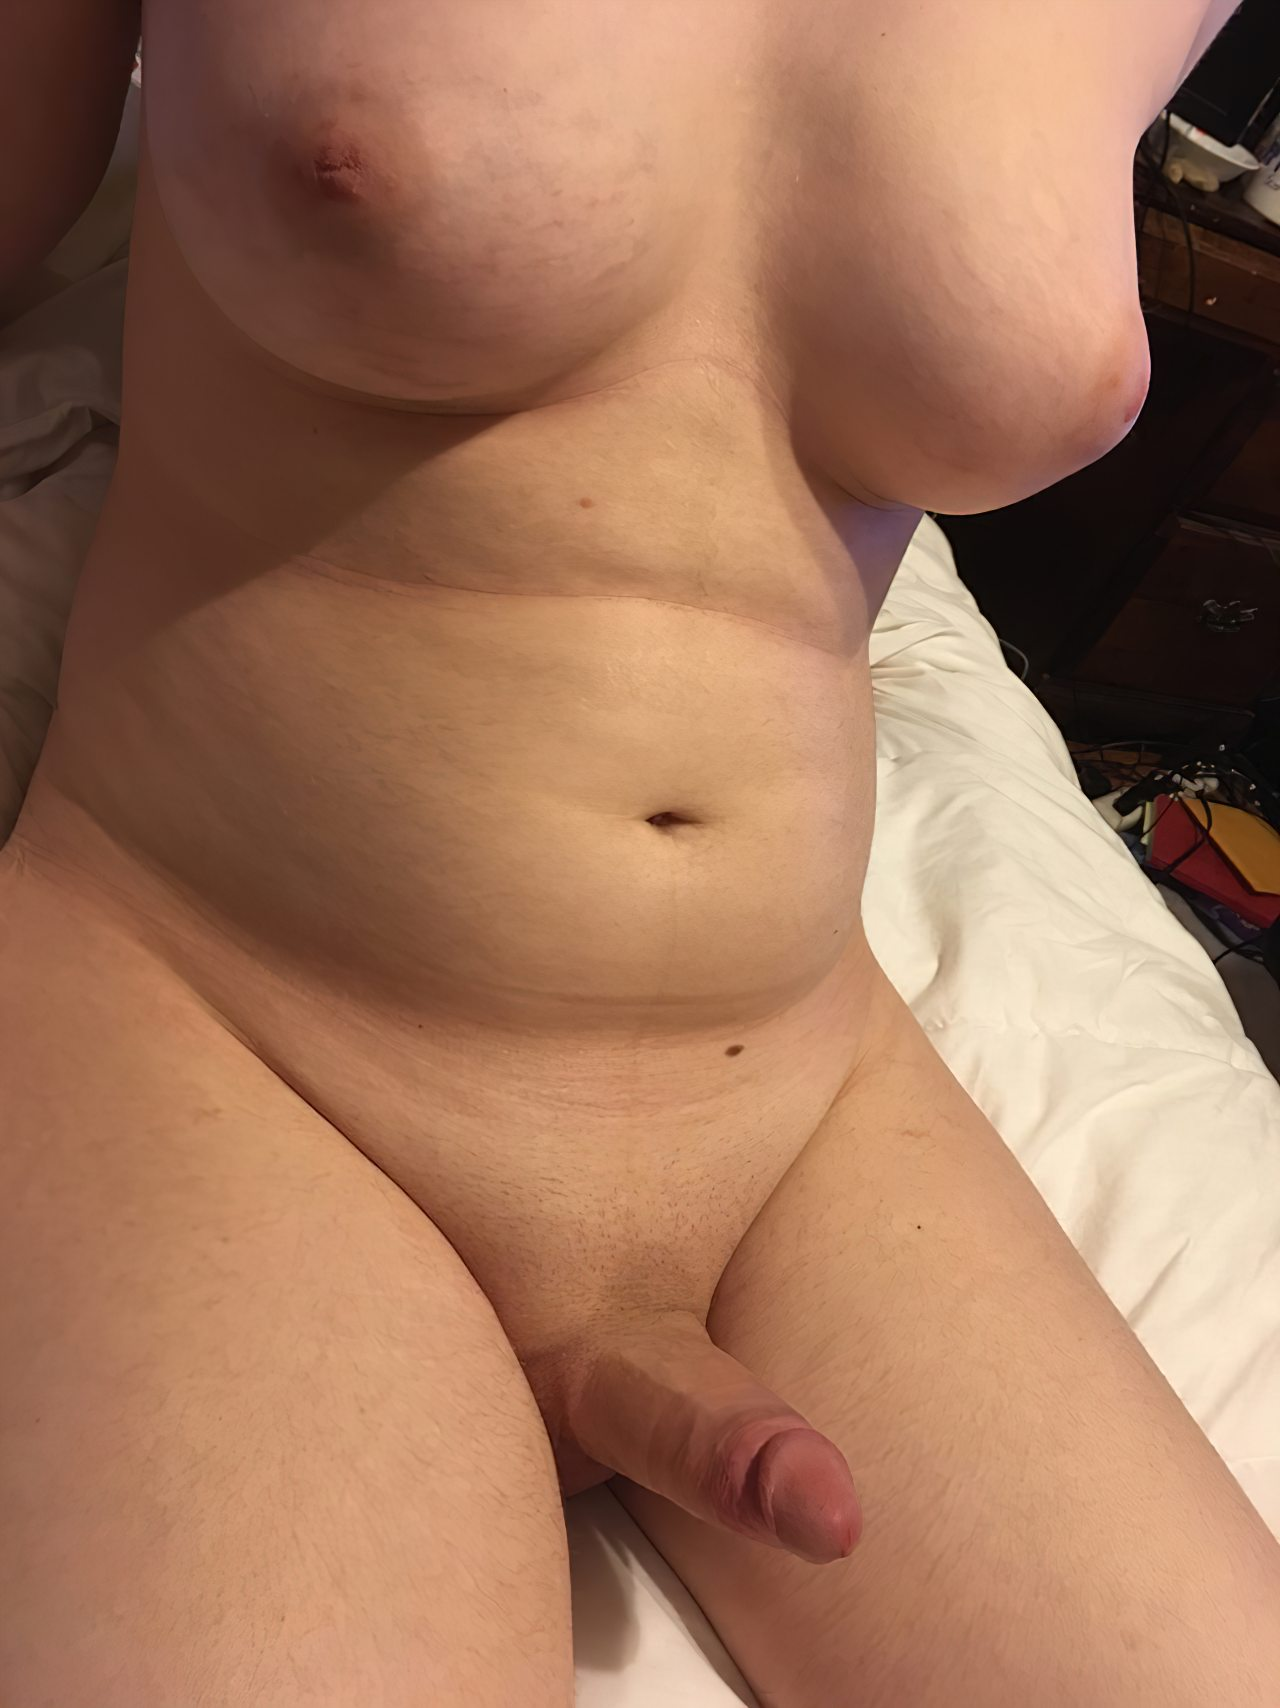 Travestis Pictures (13)